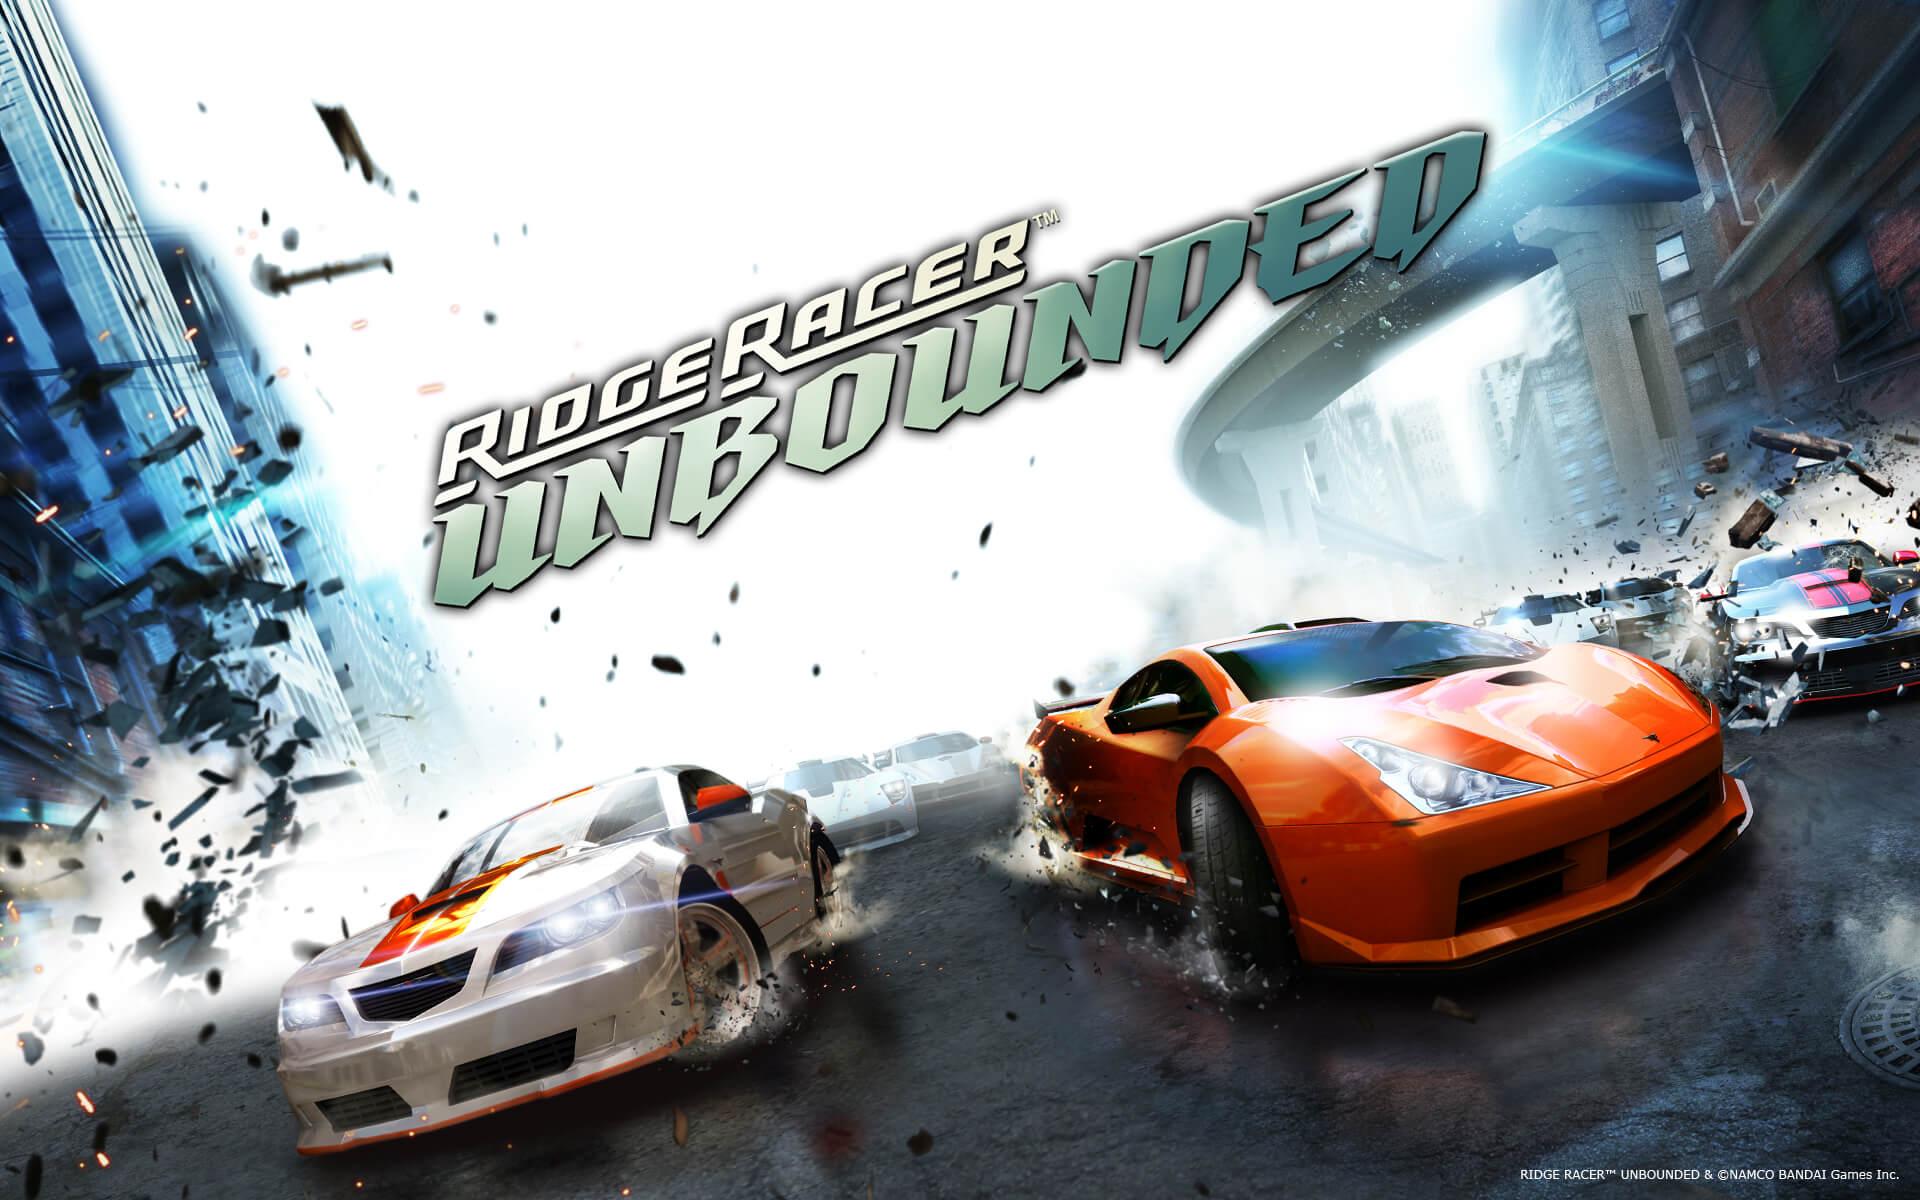 Ridge Racer Unbounded Cheats and Unlocker